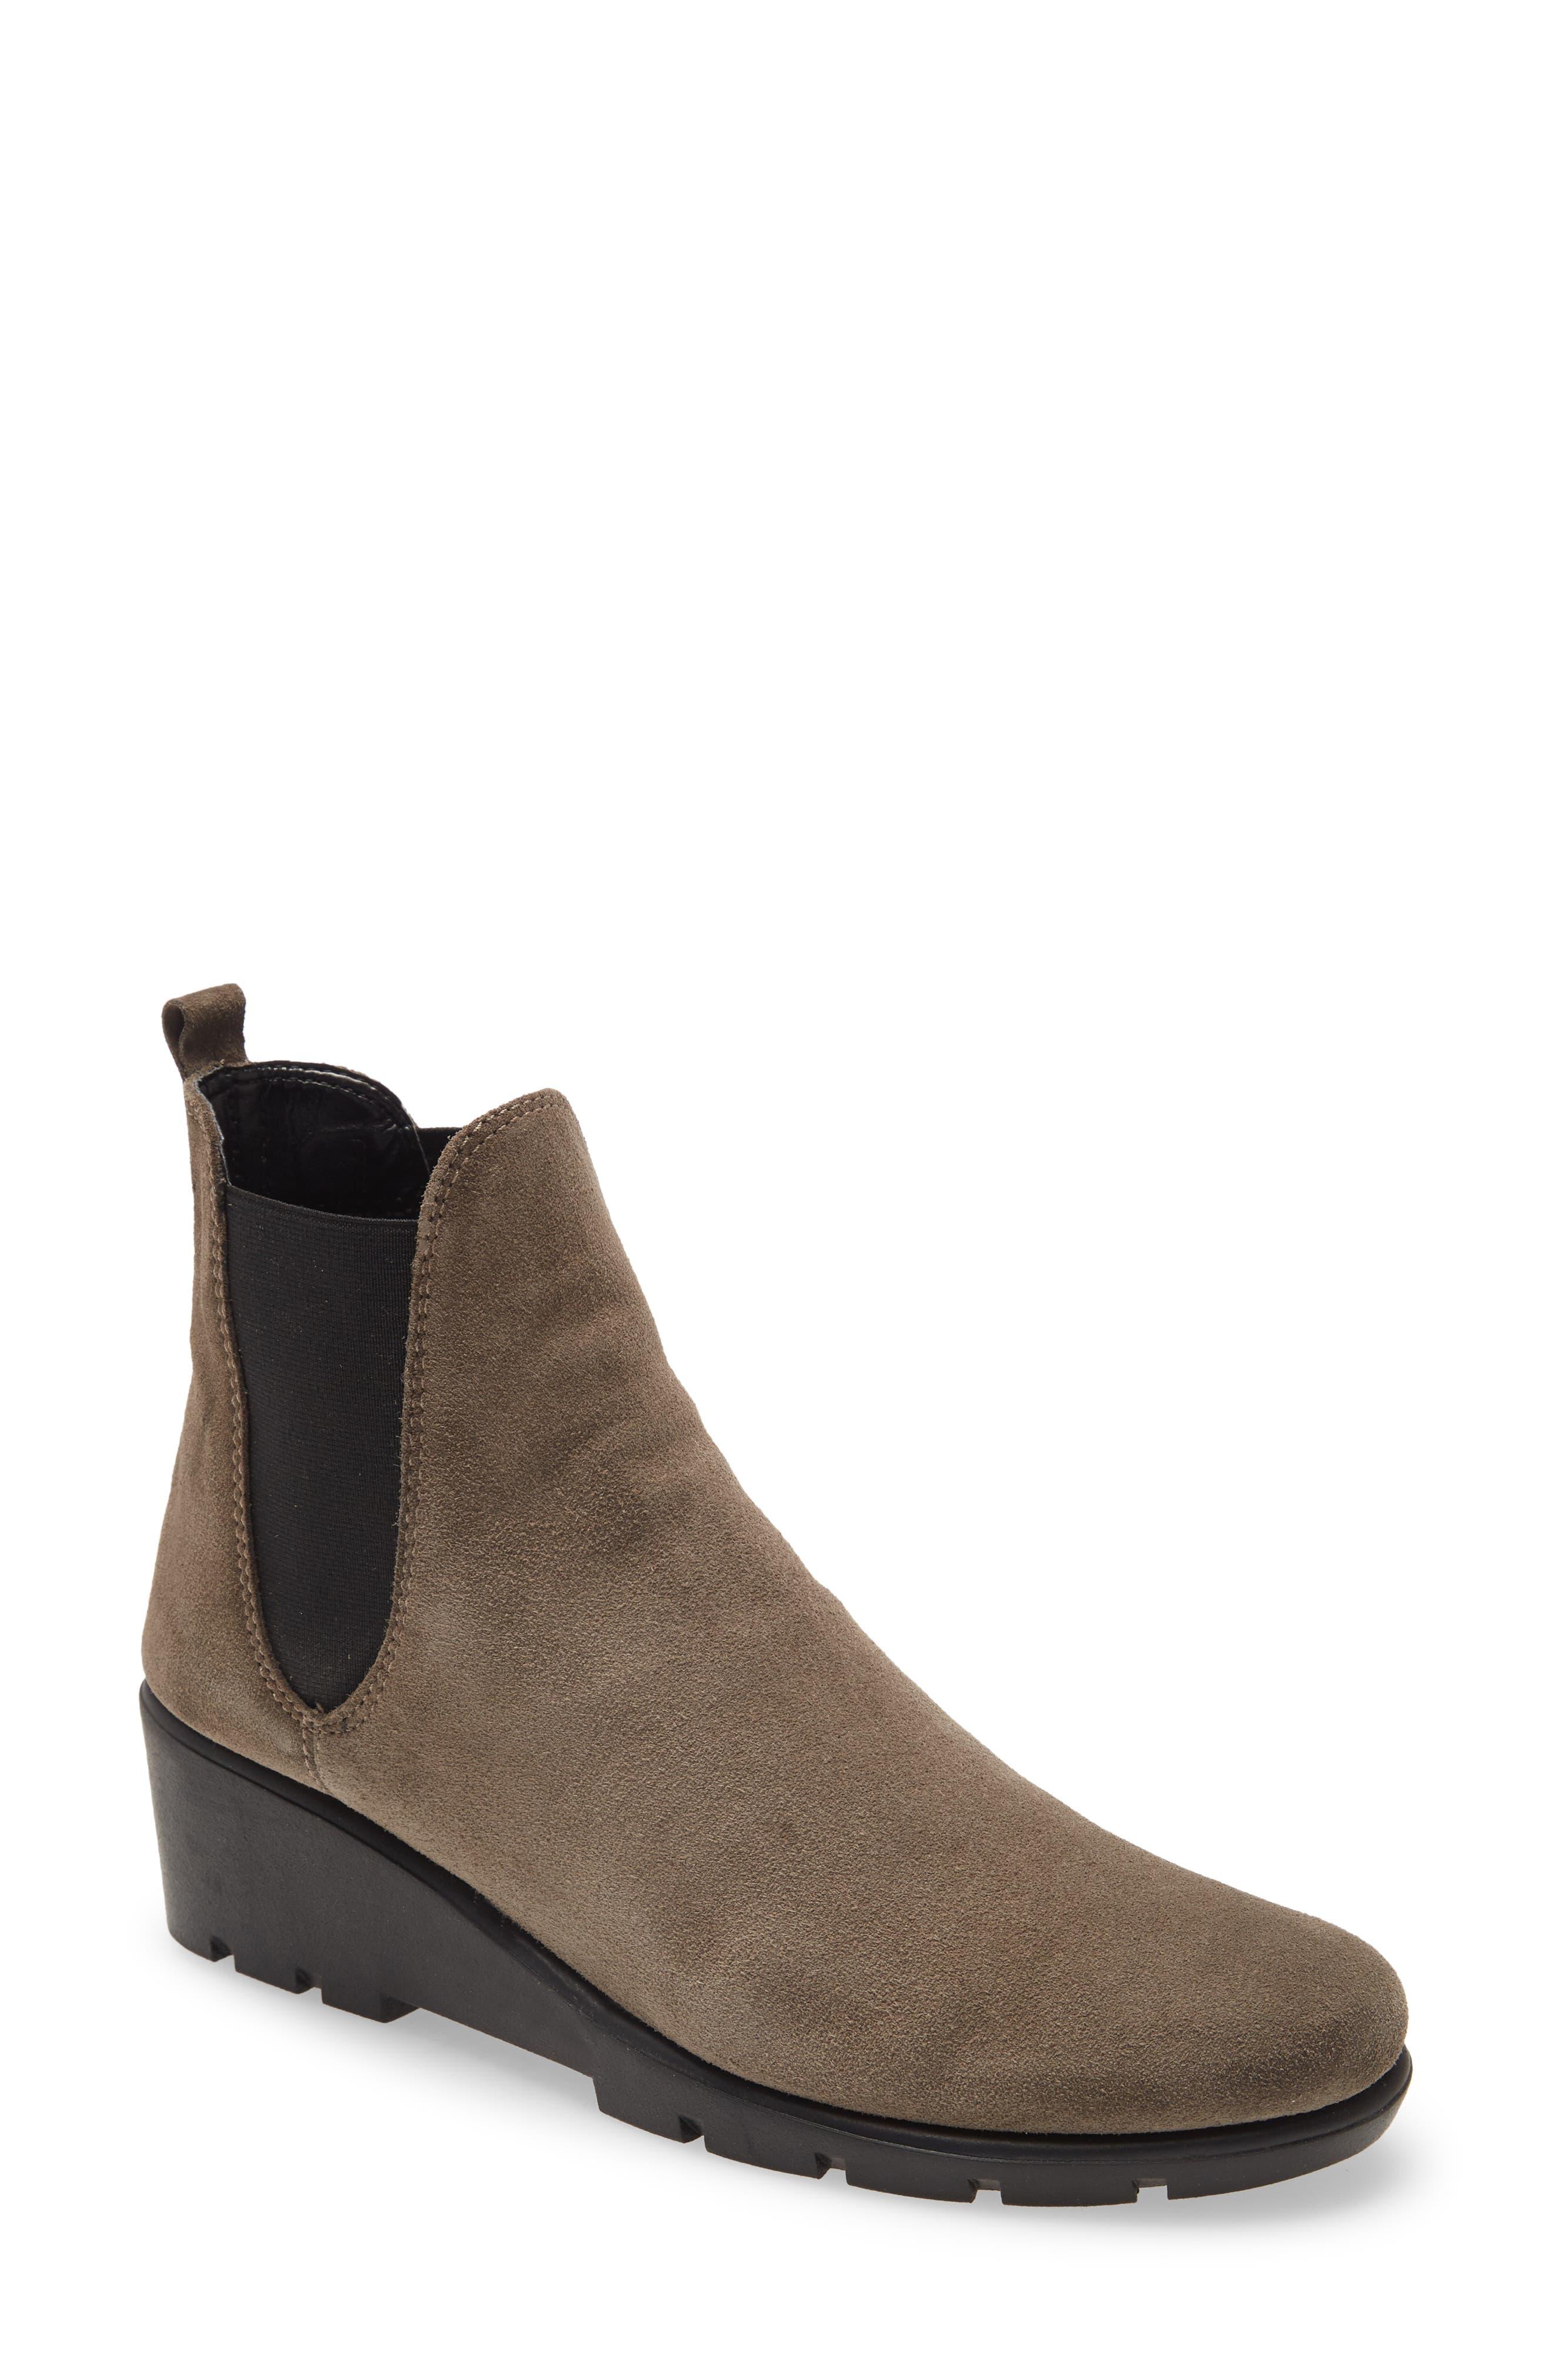 Women's The FLEXX Shoes | Nordstrom